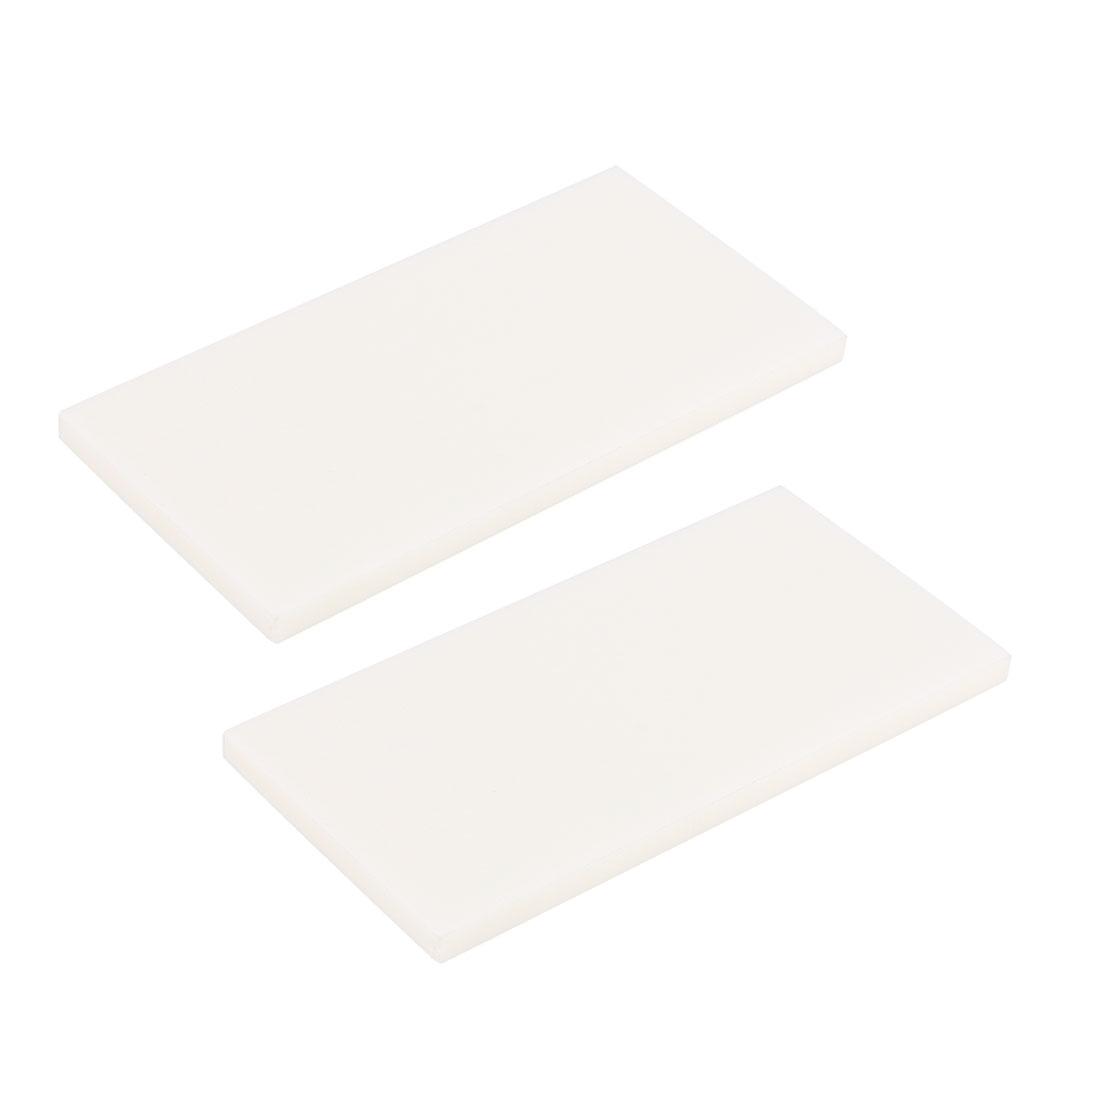 2pcs Soldering Board Ceramic Insulation Board 2.5 x 1.3 x 0.15inch/62 x 33 x 4mm